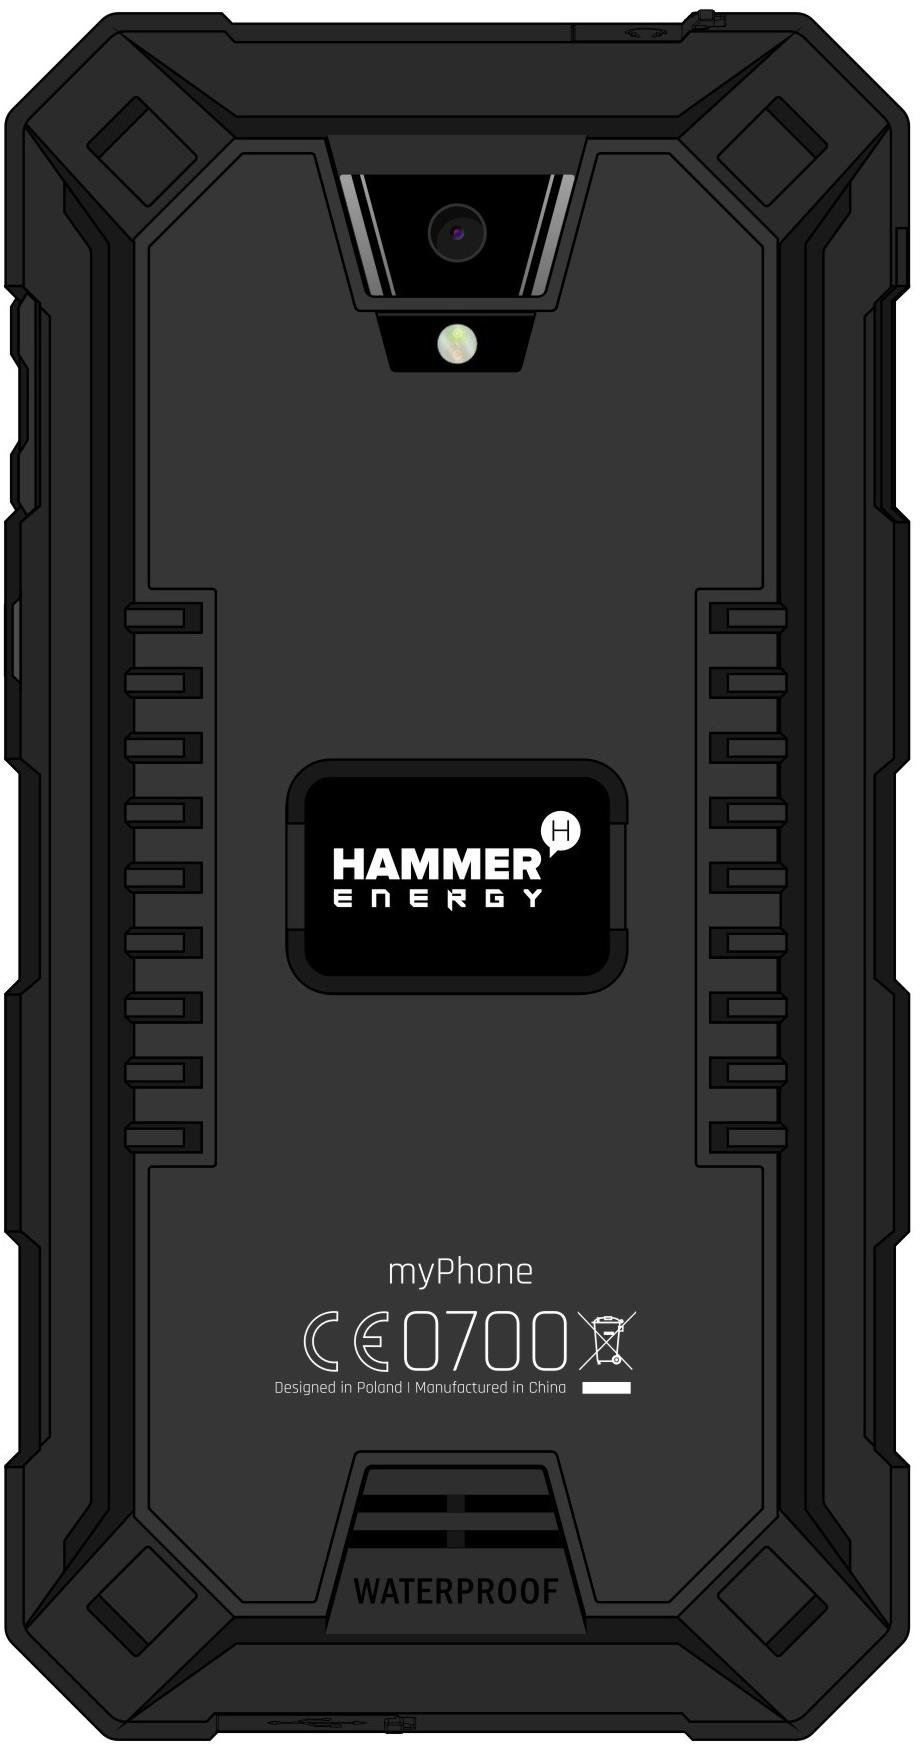 chytrý telefon myPhone Hammer Energy